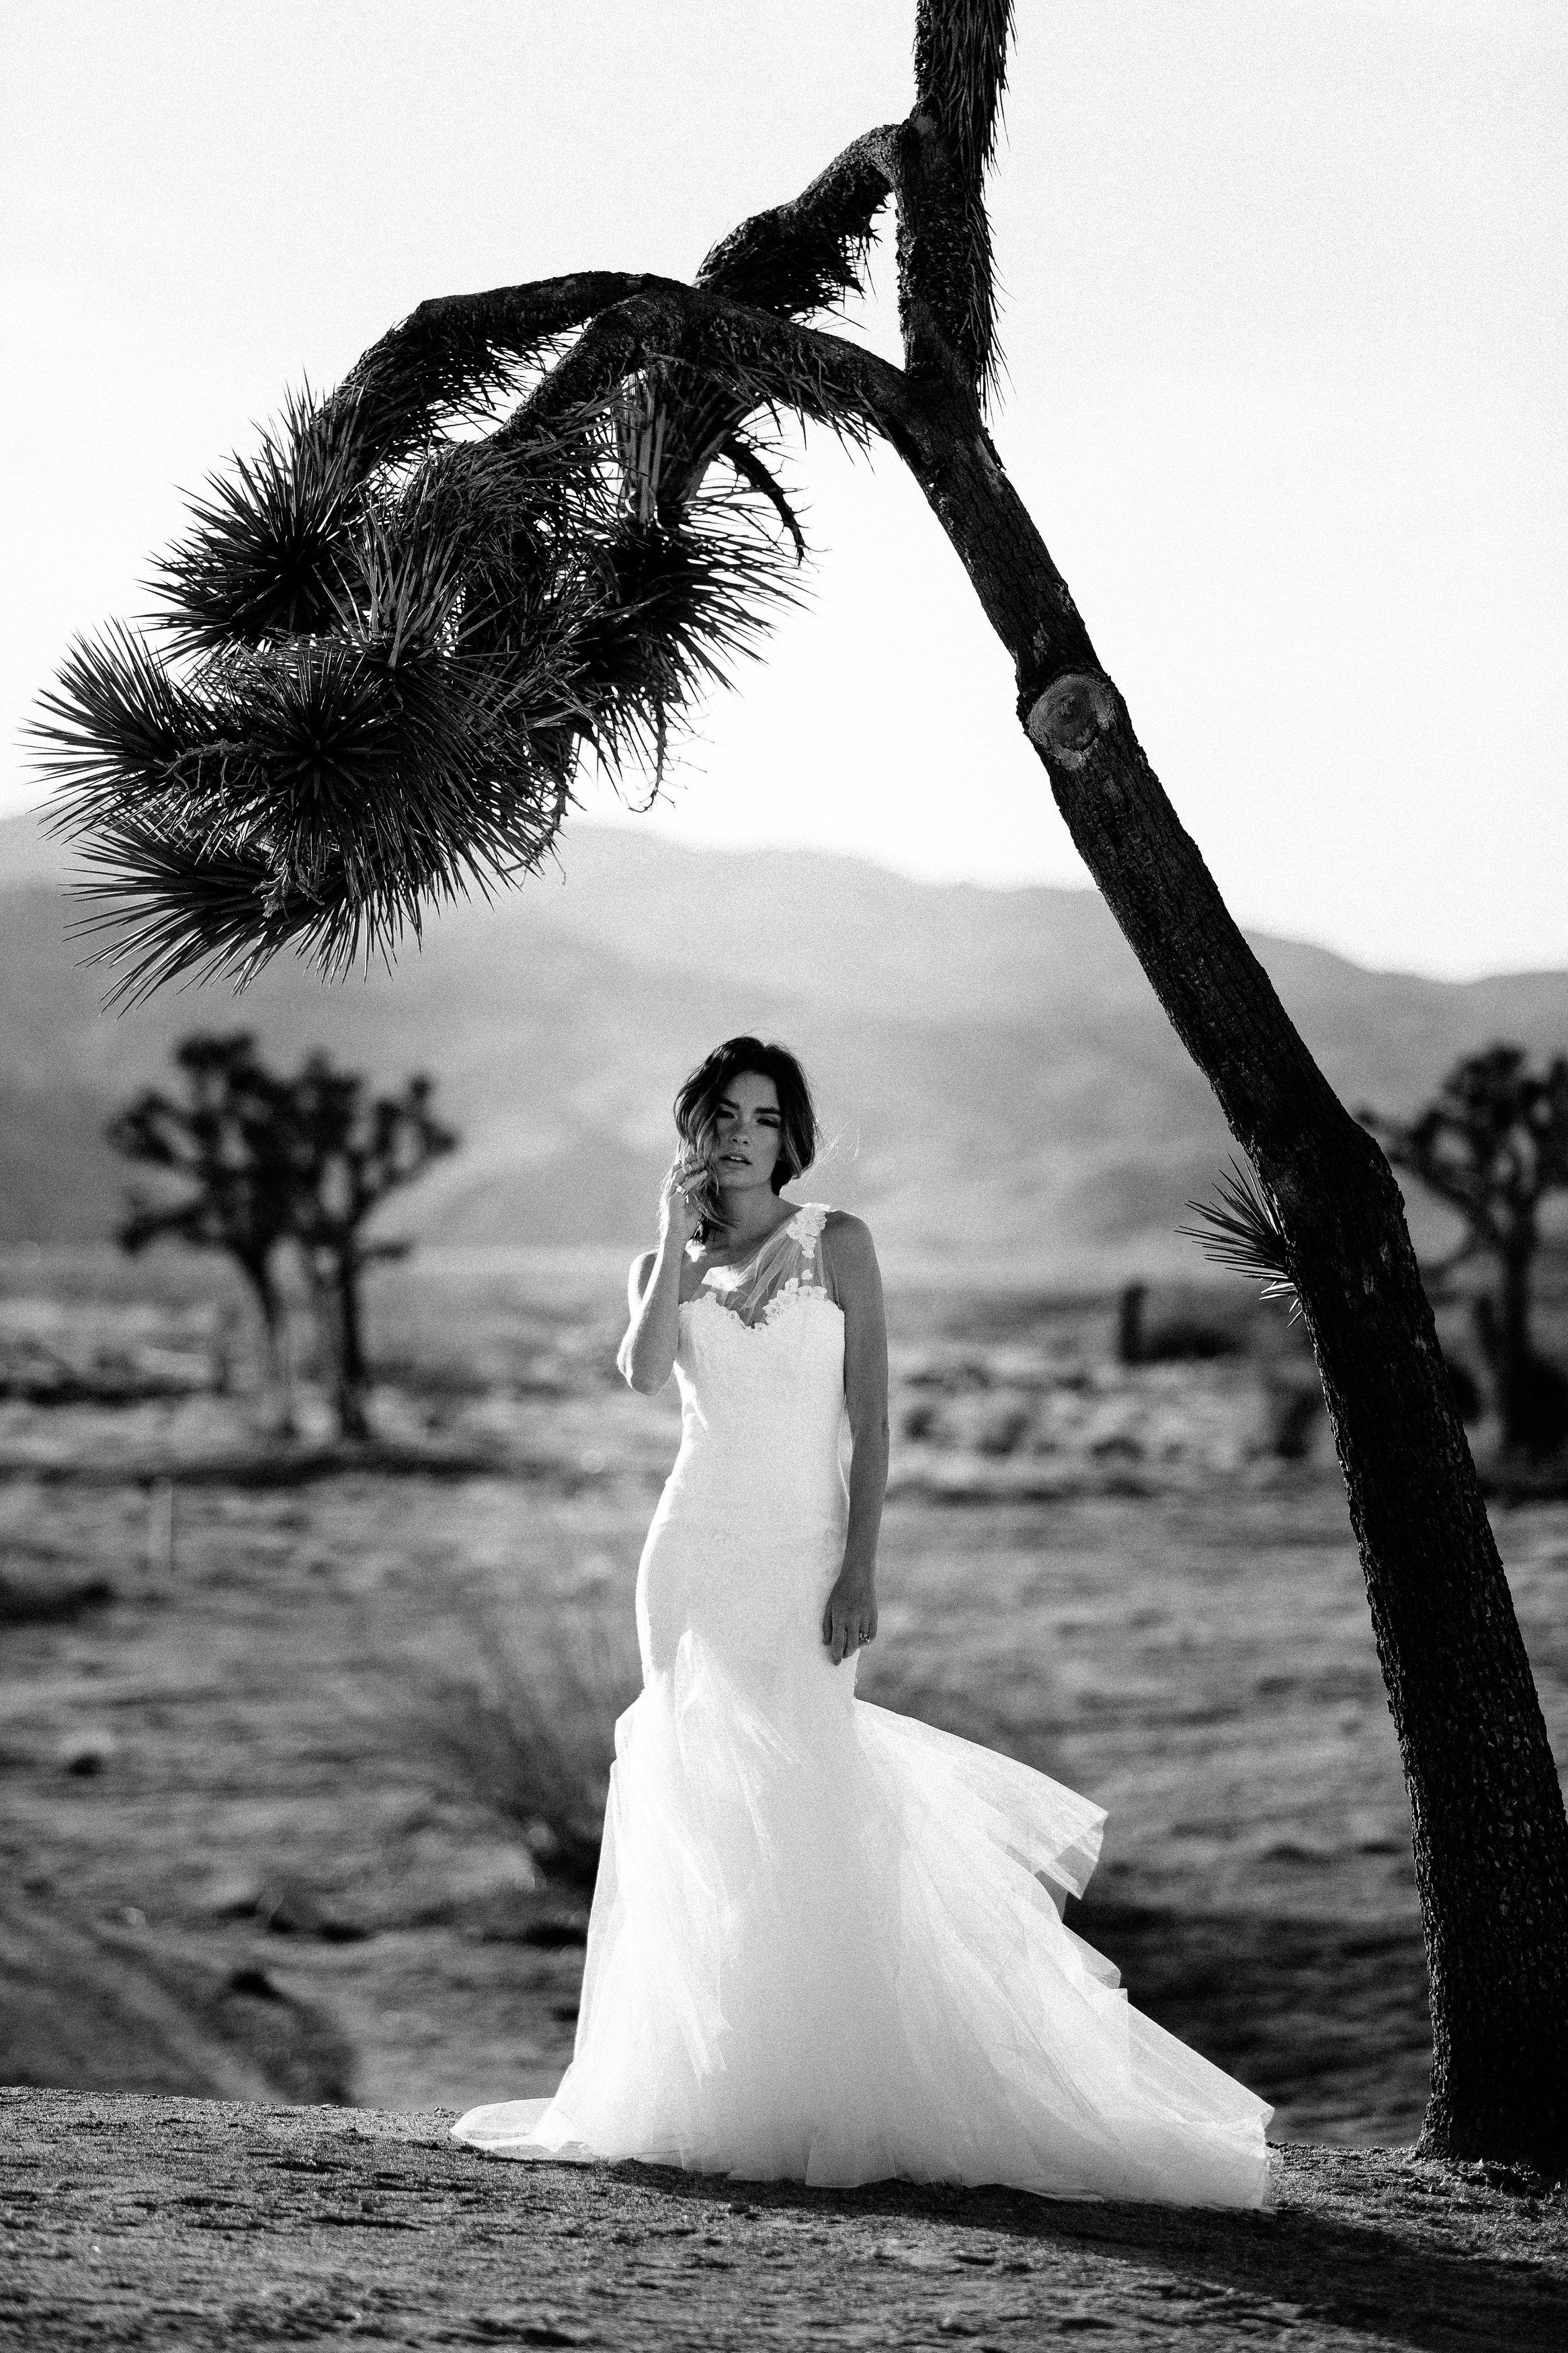 Dress: Astrid & Mercedes Artemisia | Photographer: Tim Melideo | HMU: Colbie Wilson | Florals: Morgan Wynia | Model: Quigley | Venue: Homestead Modern